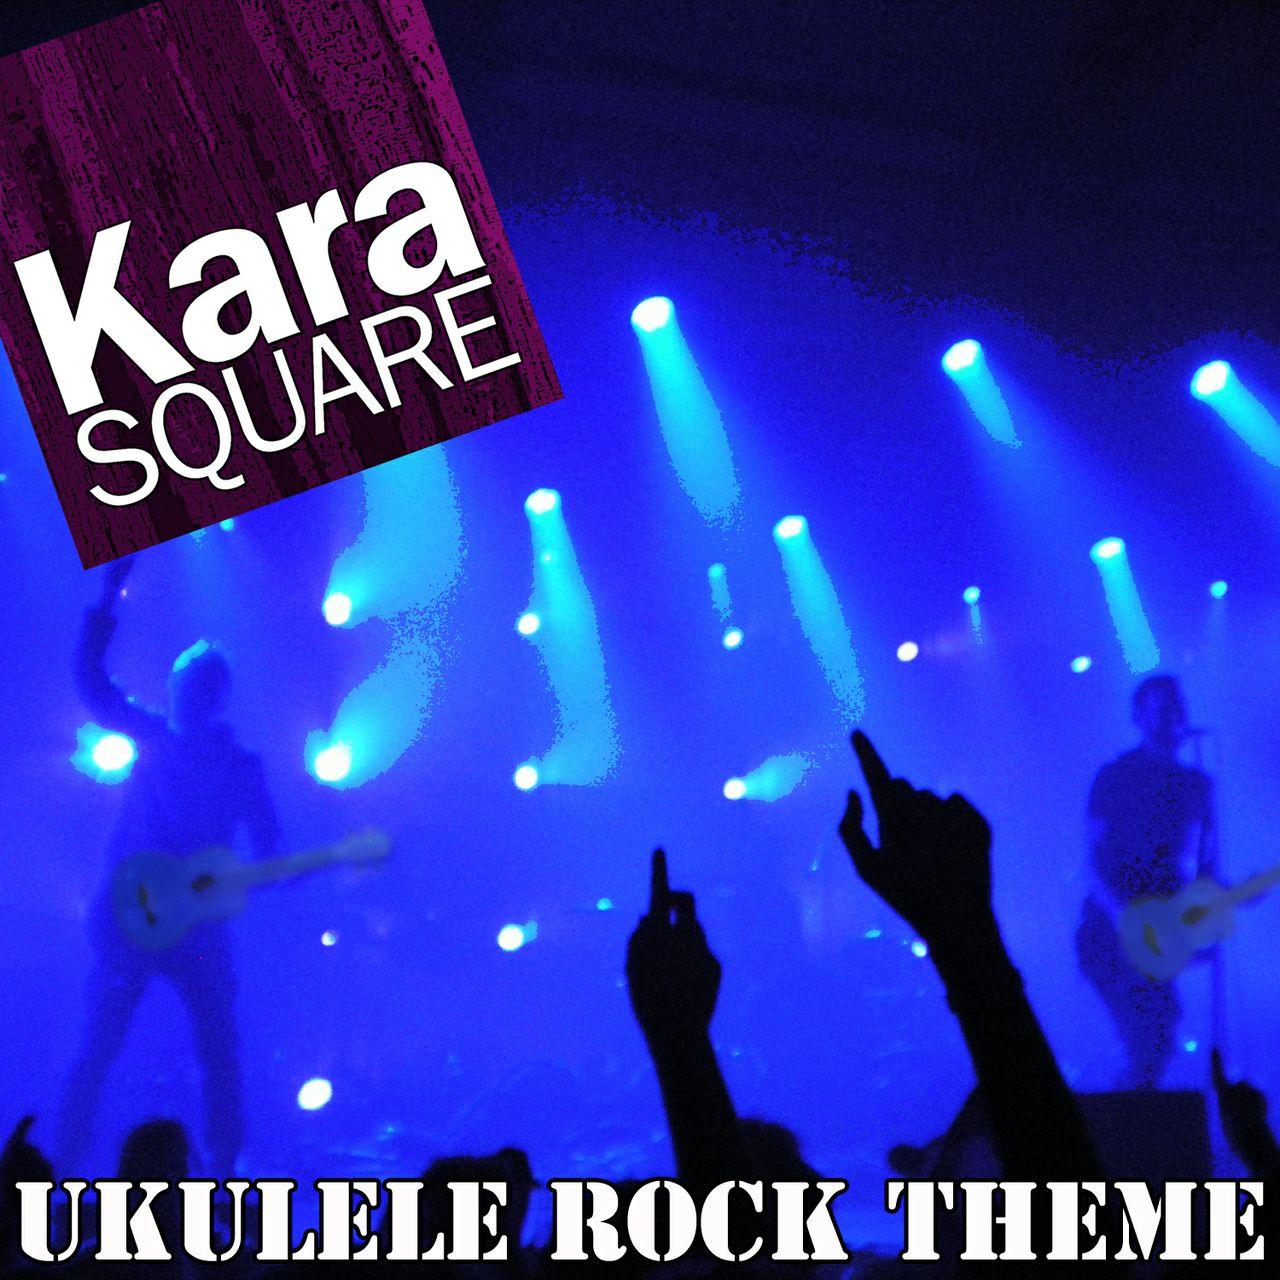 License/Zip Pack - Project Budget $501-2000 Ukulele Rock Theme